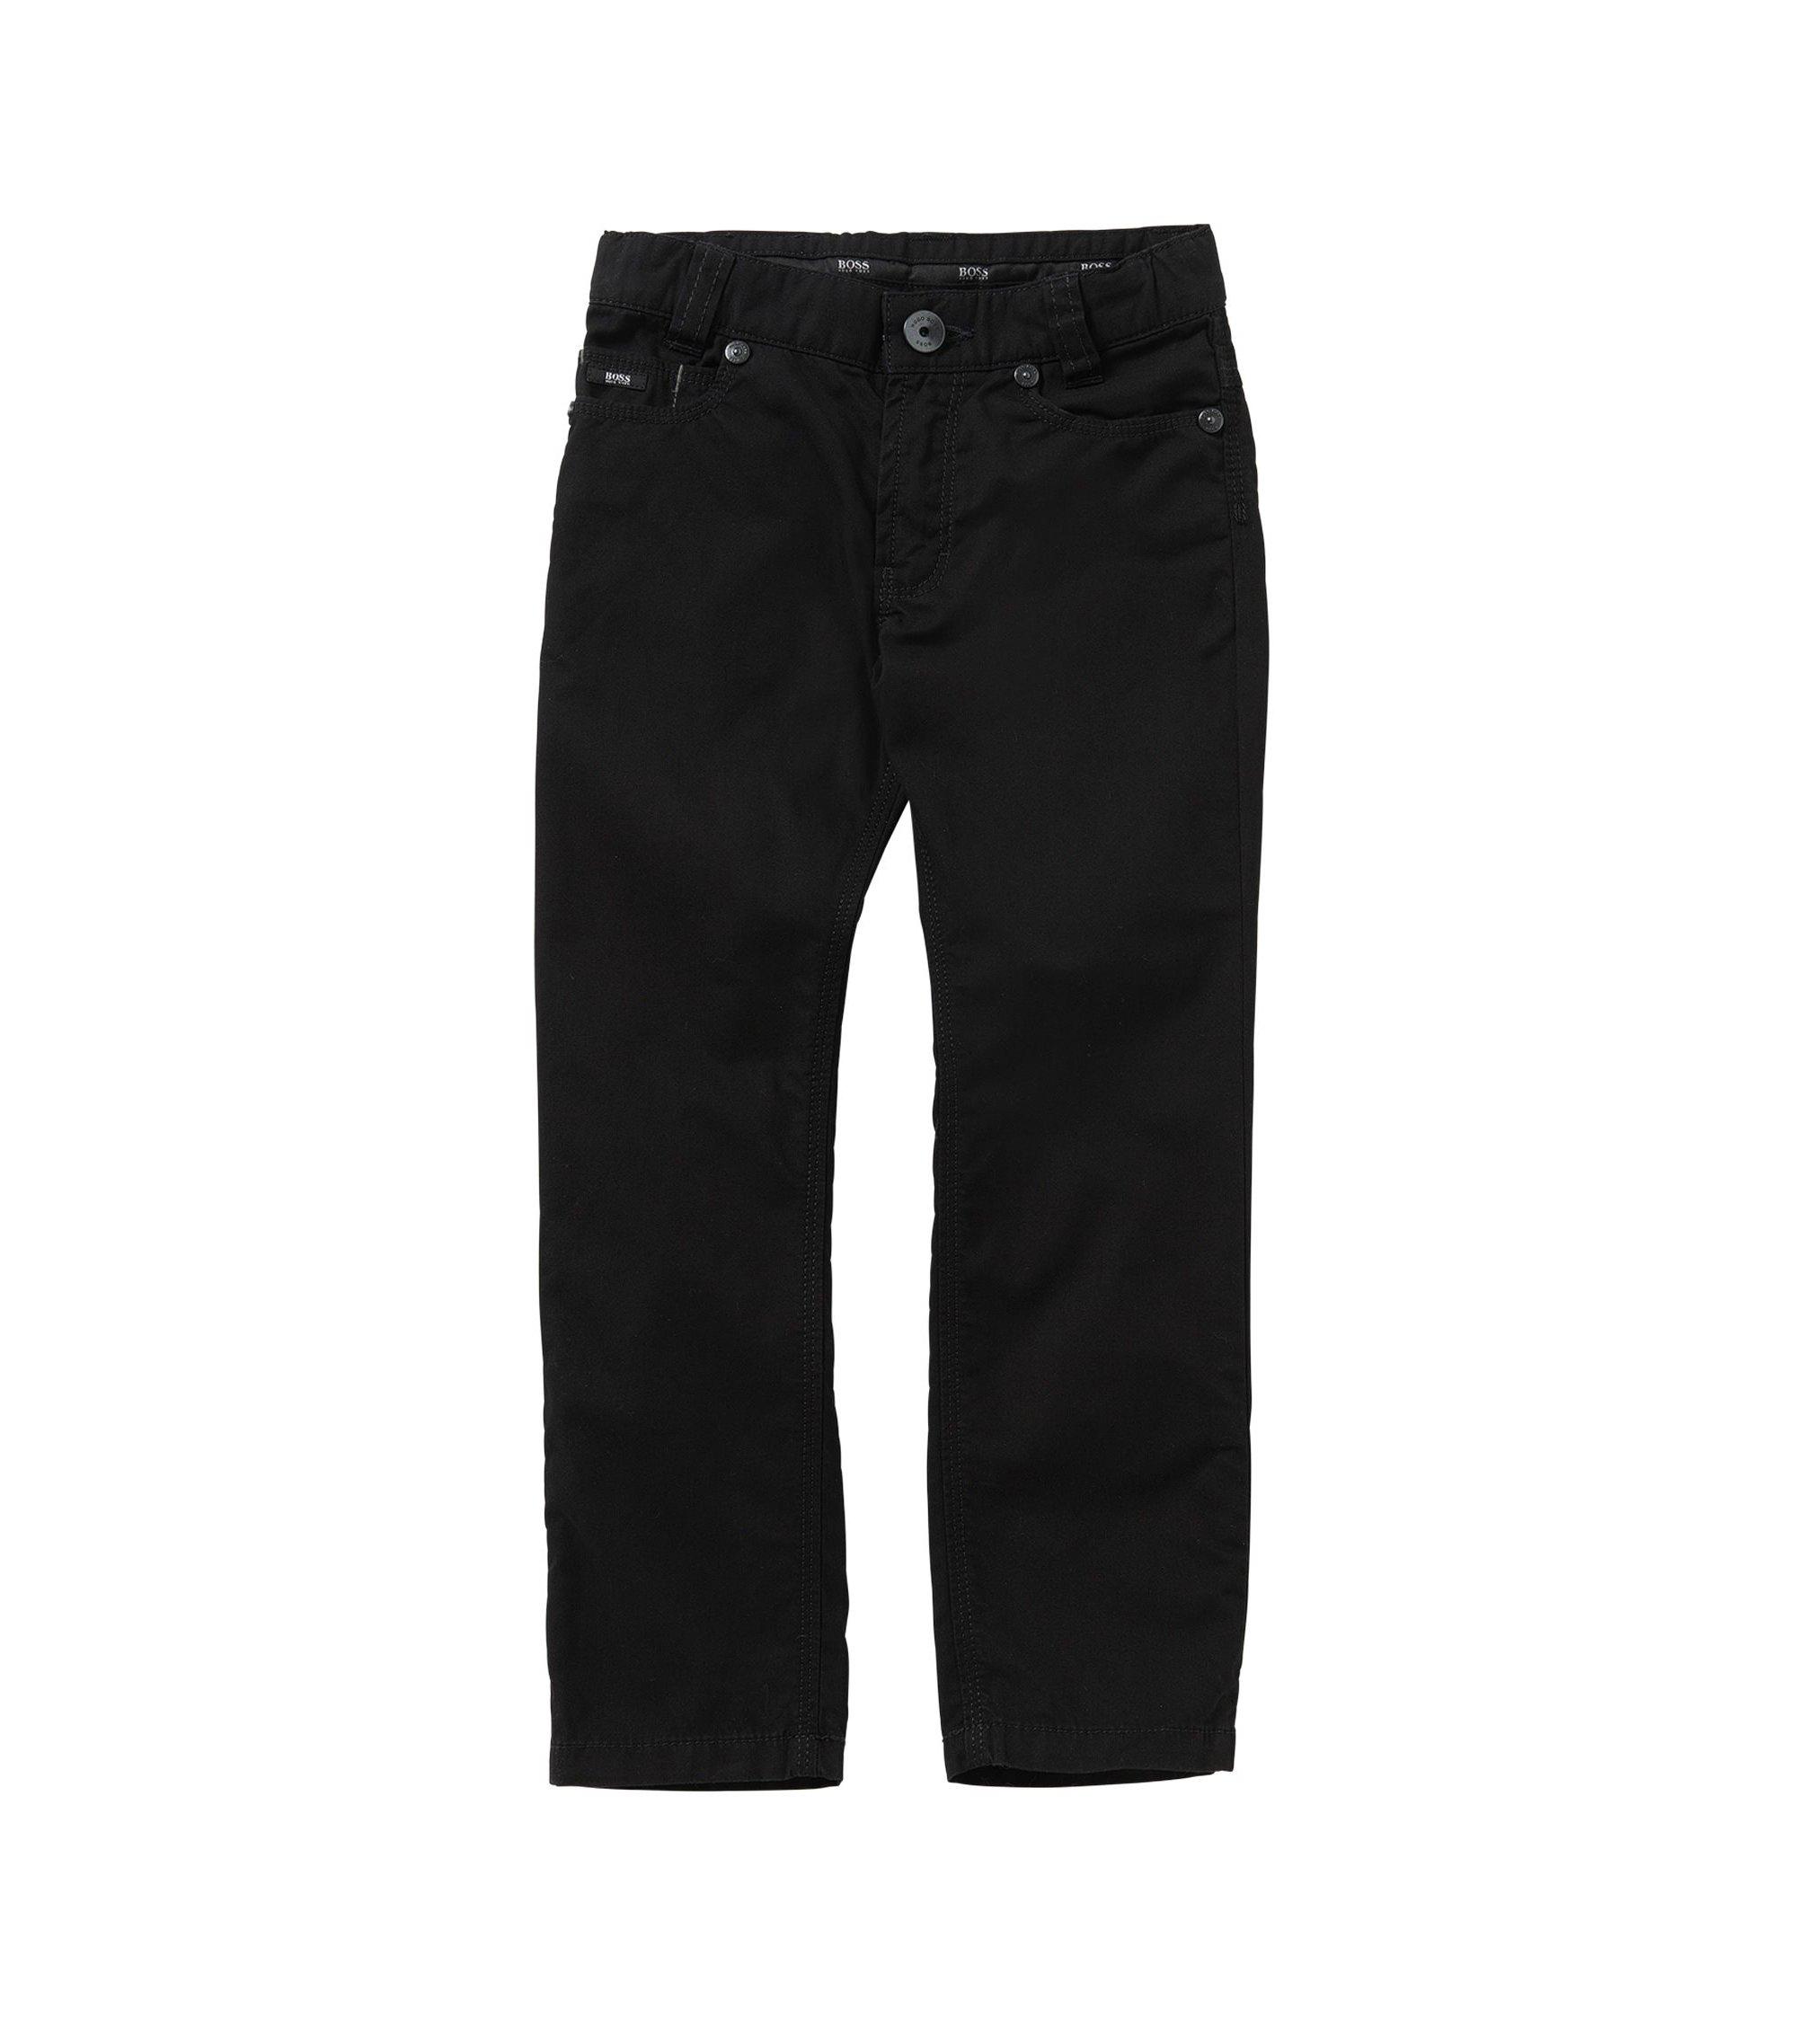 Unifarbene Slim-Fit Kids-Hose aus Baumwolle: 'J24393', Schwarz